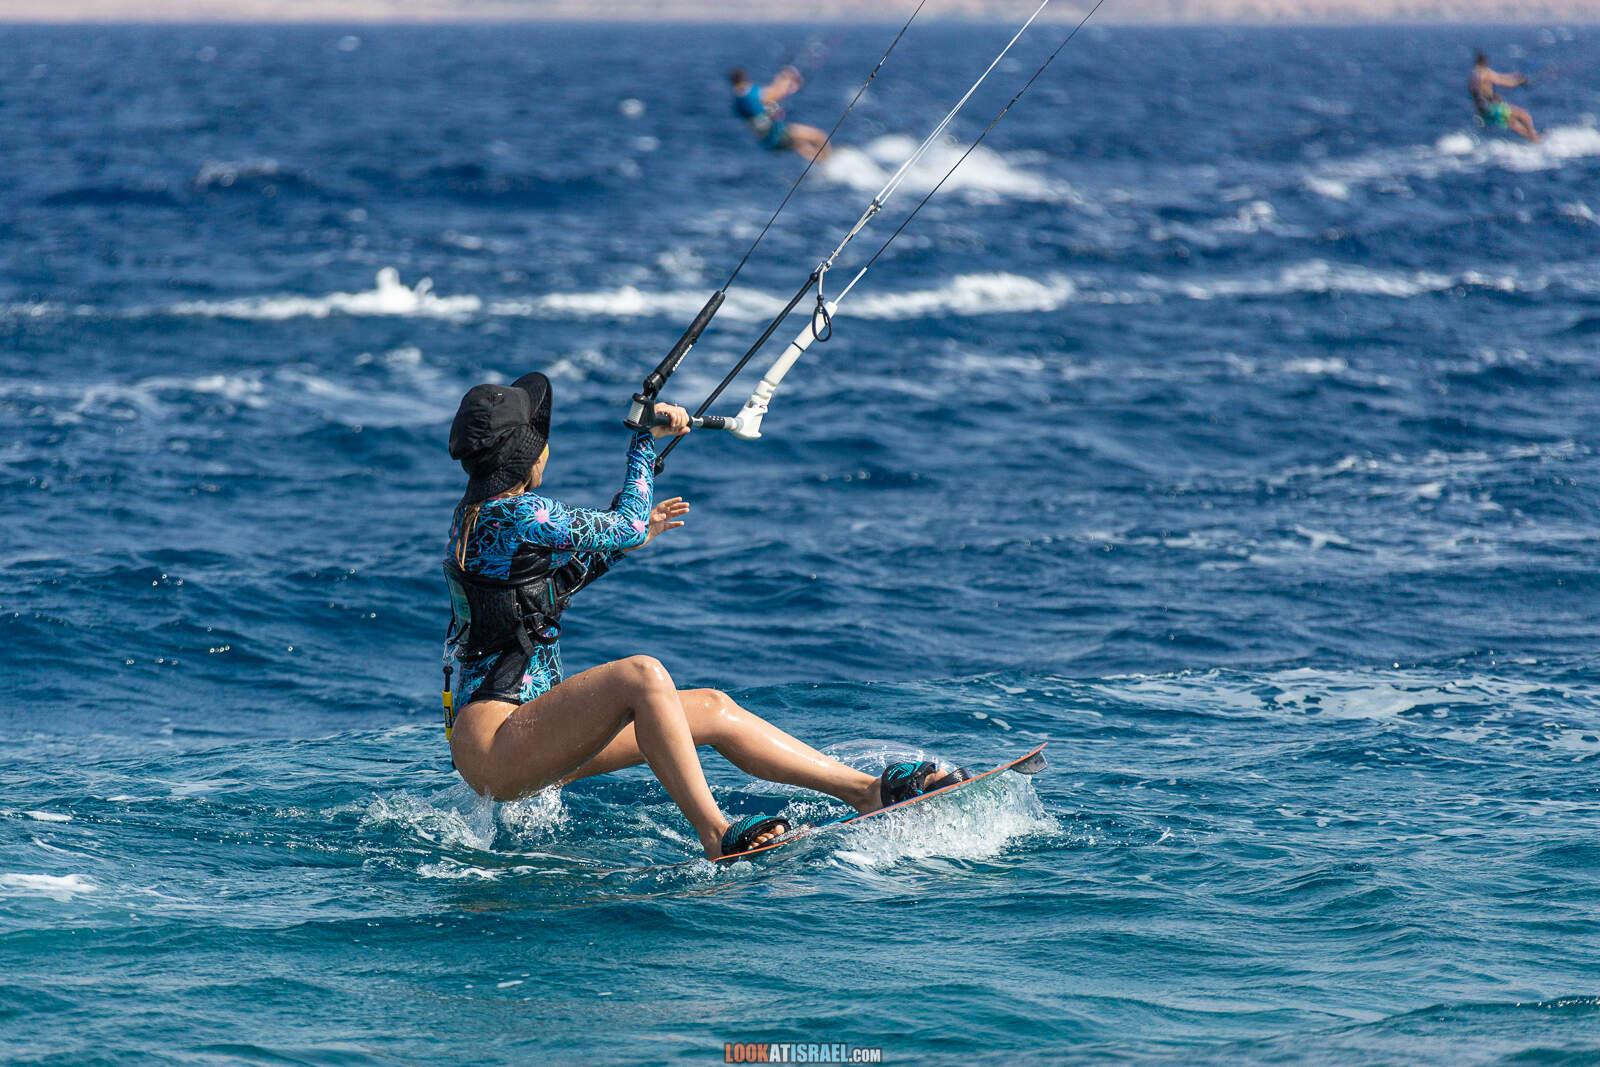 Кайтсерфинг на Красном море, Эйлат | Red sea kitesurfing, Eilat | LookAtIsrael.com - Фото путешествия по Израилю